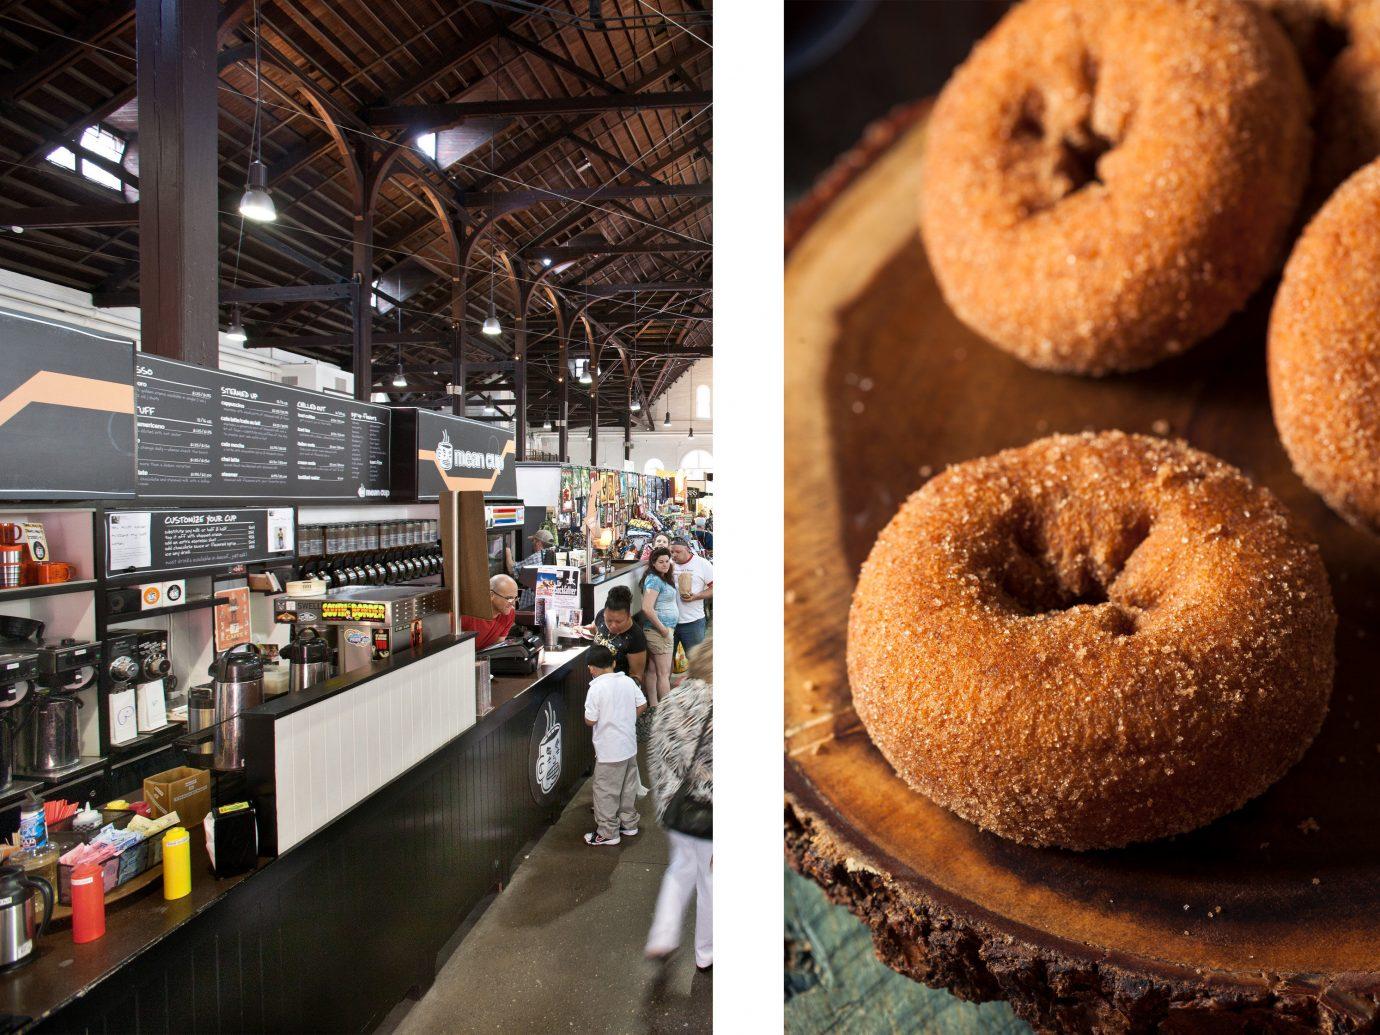 Food + Drink doughnut indoor food bakery baking dessert donut several